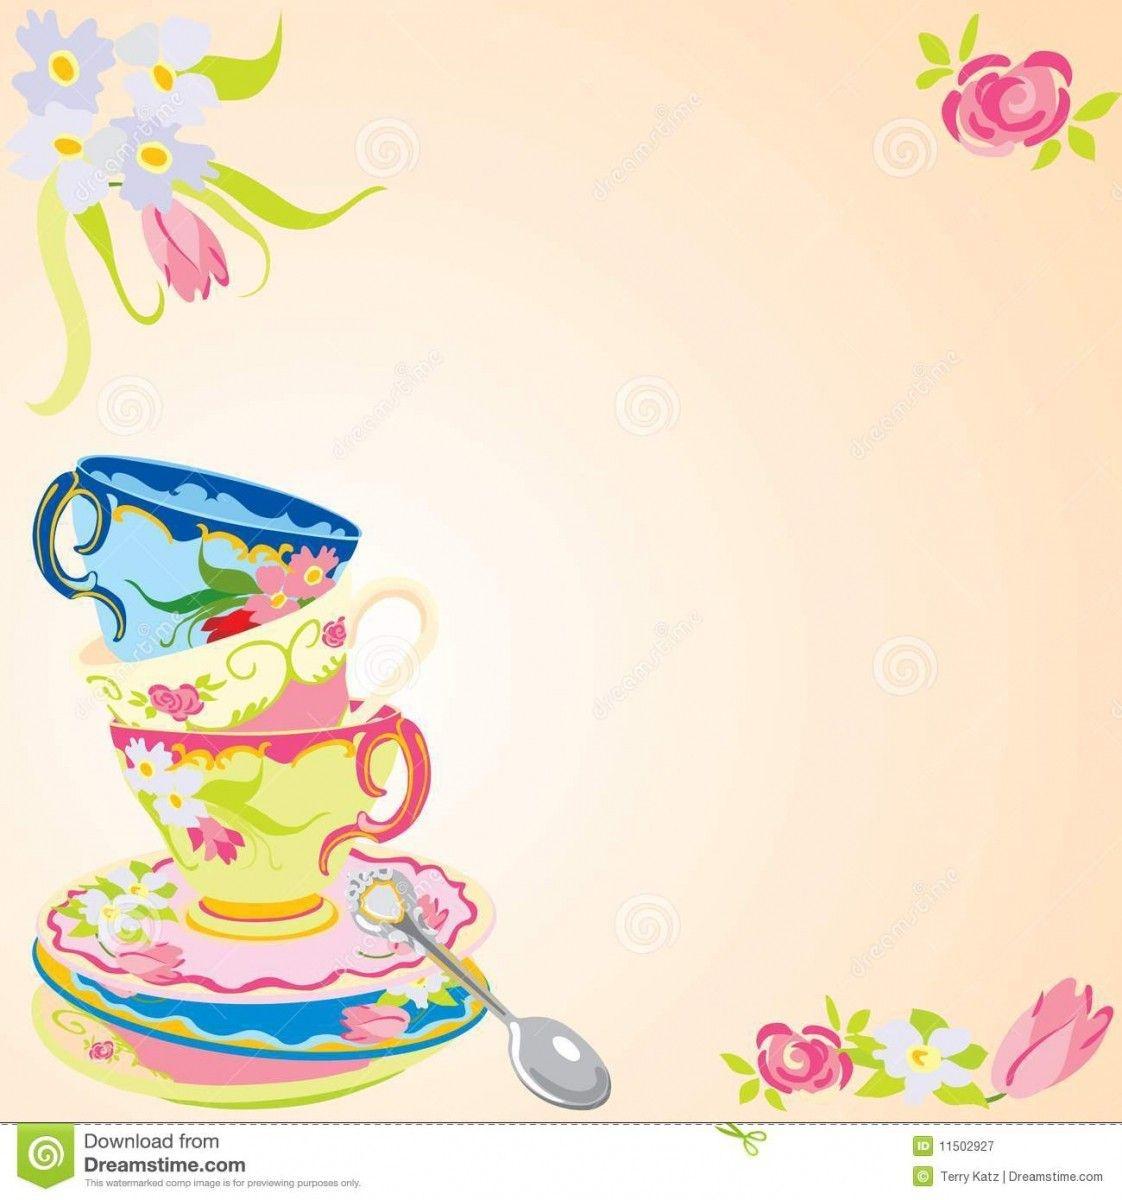 Free Printable High Tea Party Invitations | Work In 2019 | Tea Party - Mad Hatter Tea Party Invitations Free Printable